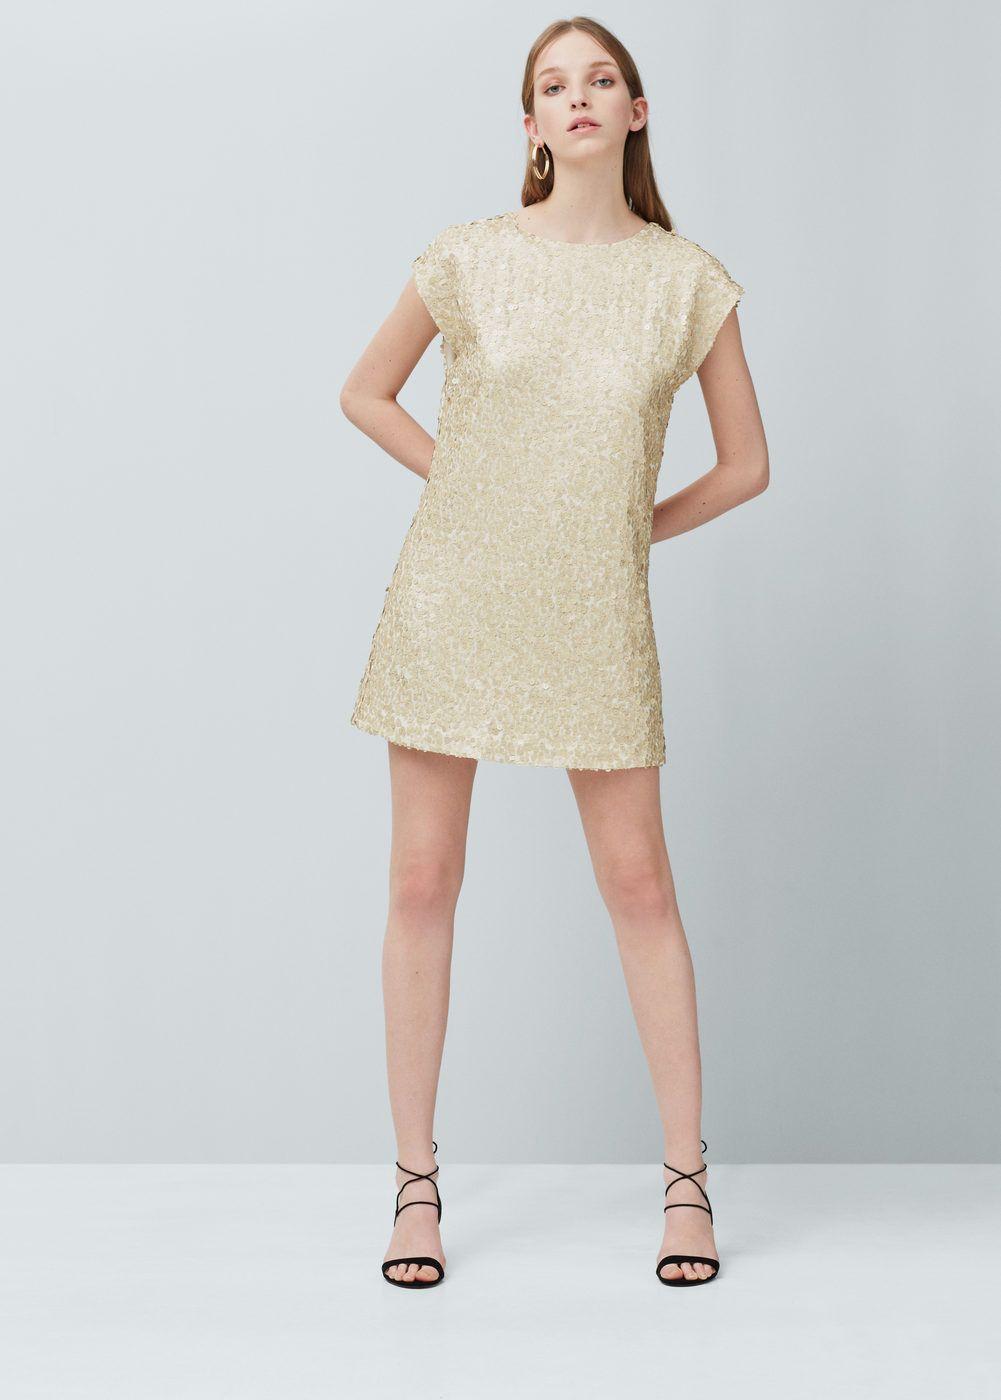 Vestido lantejoulas - Mulher   Pinterest   Vestido b172774b751c